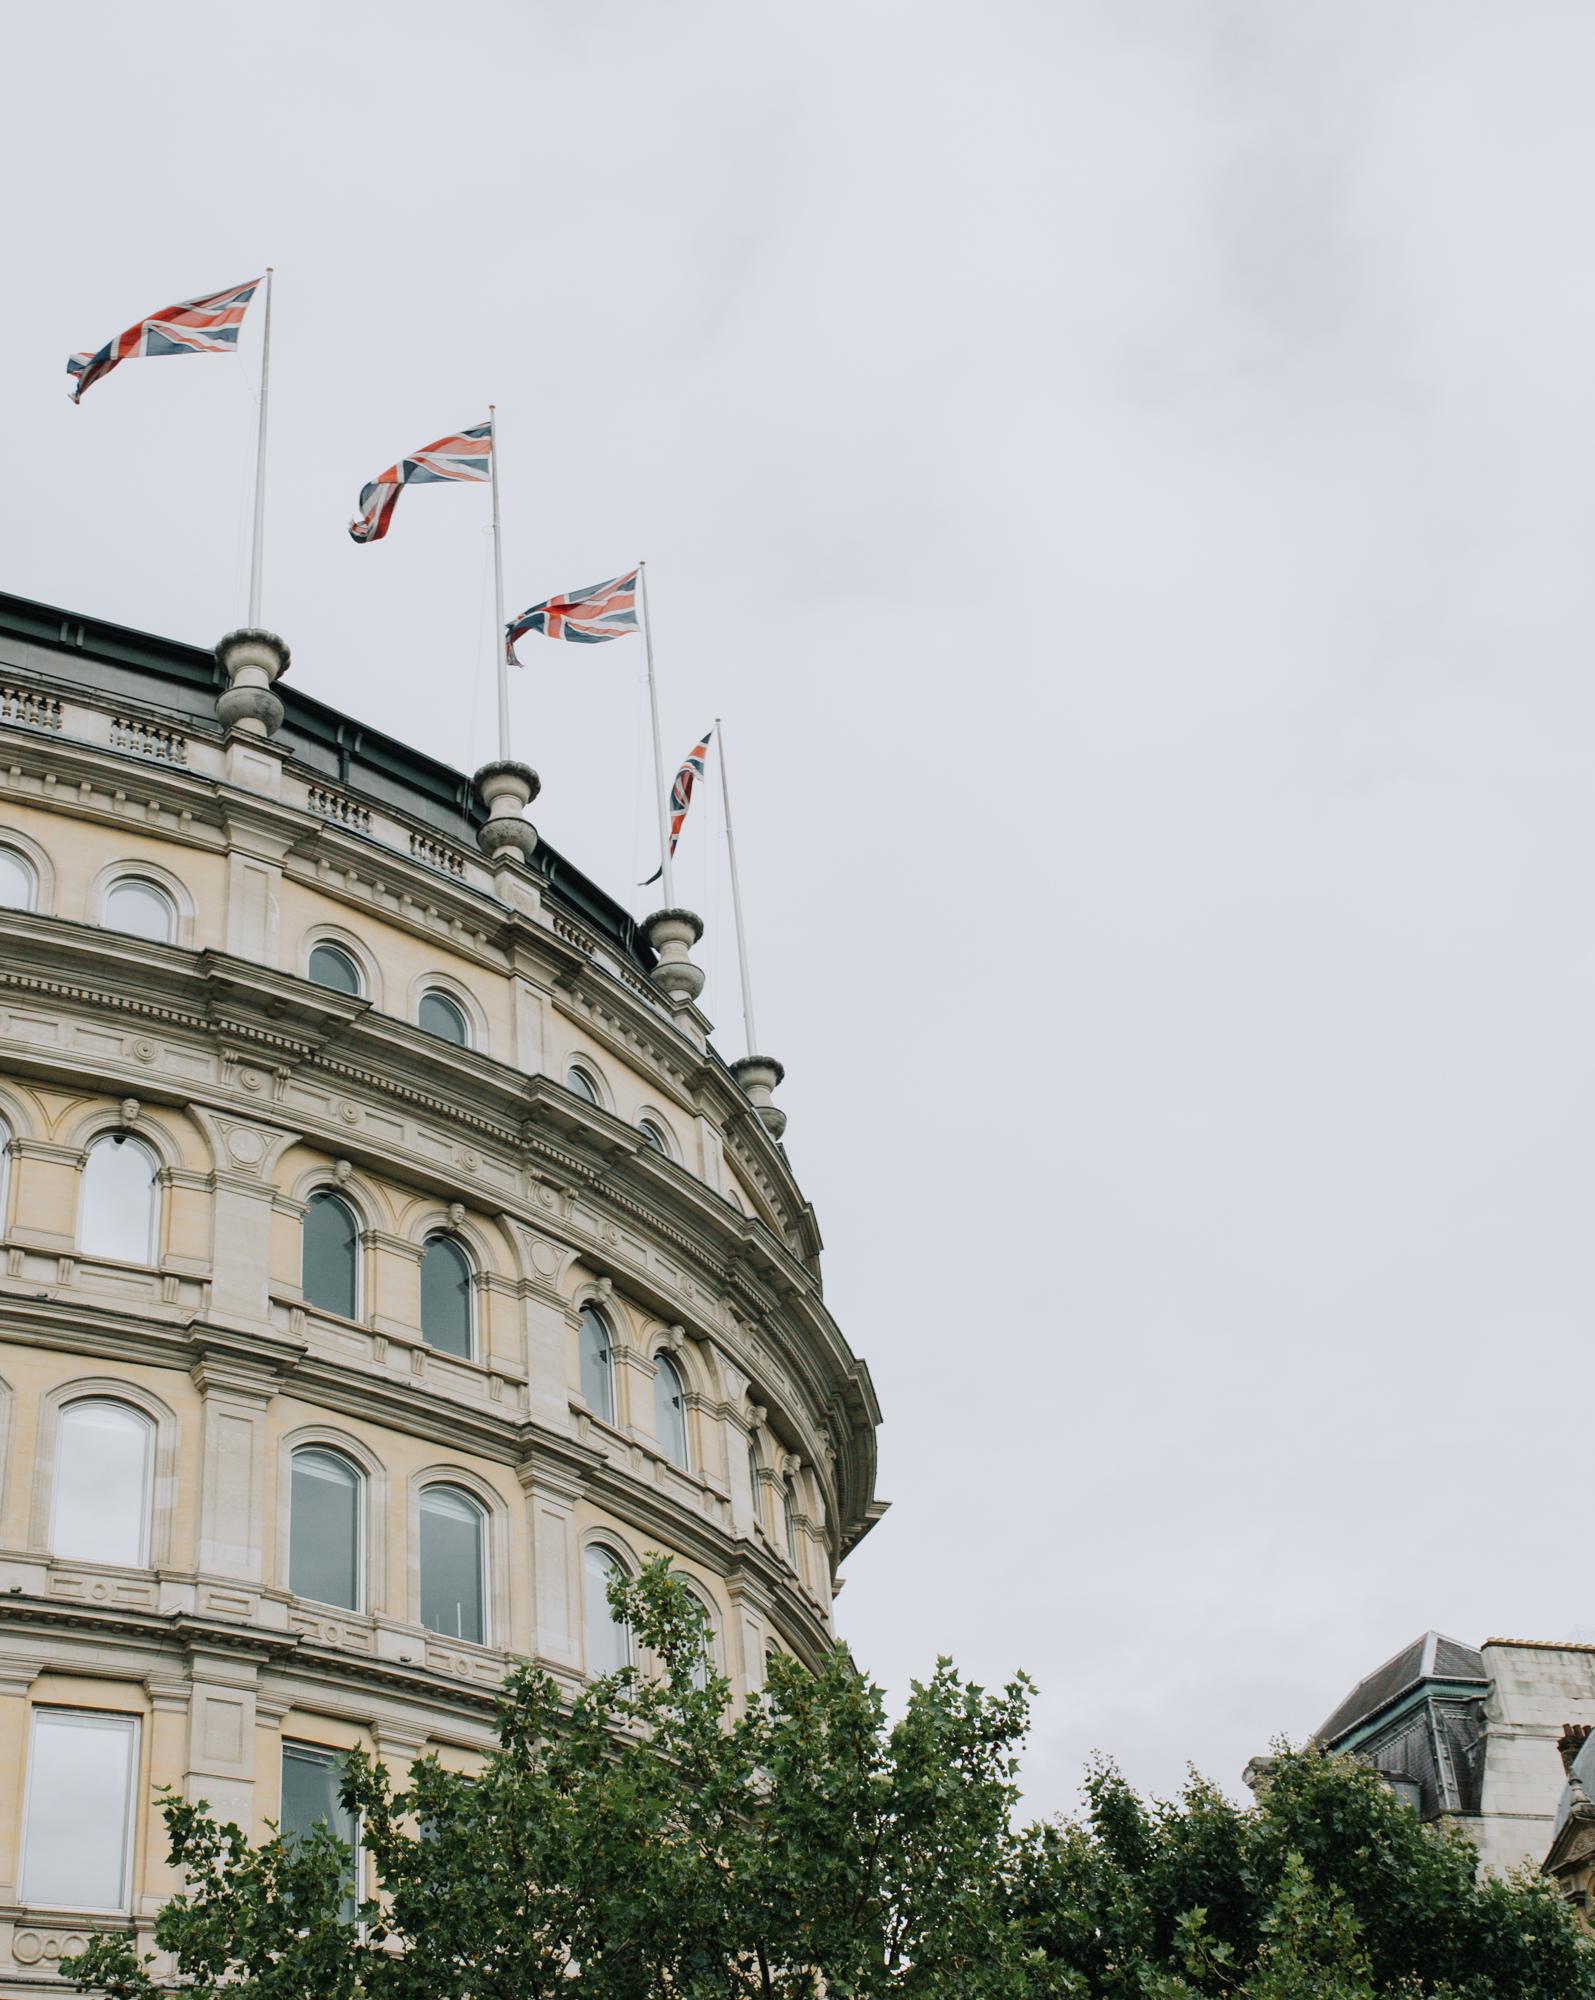 downtown_london_england.jpg